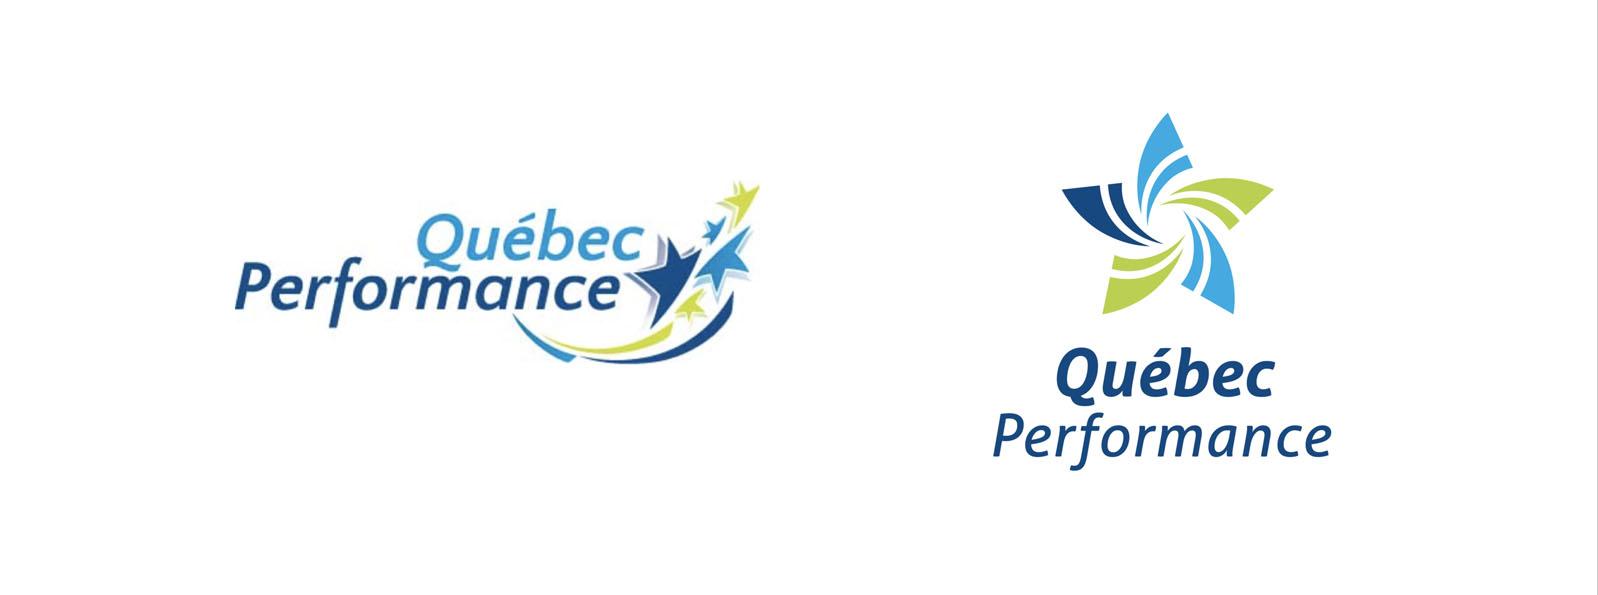 nouveau logo gymnastique quebec performance